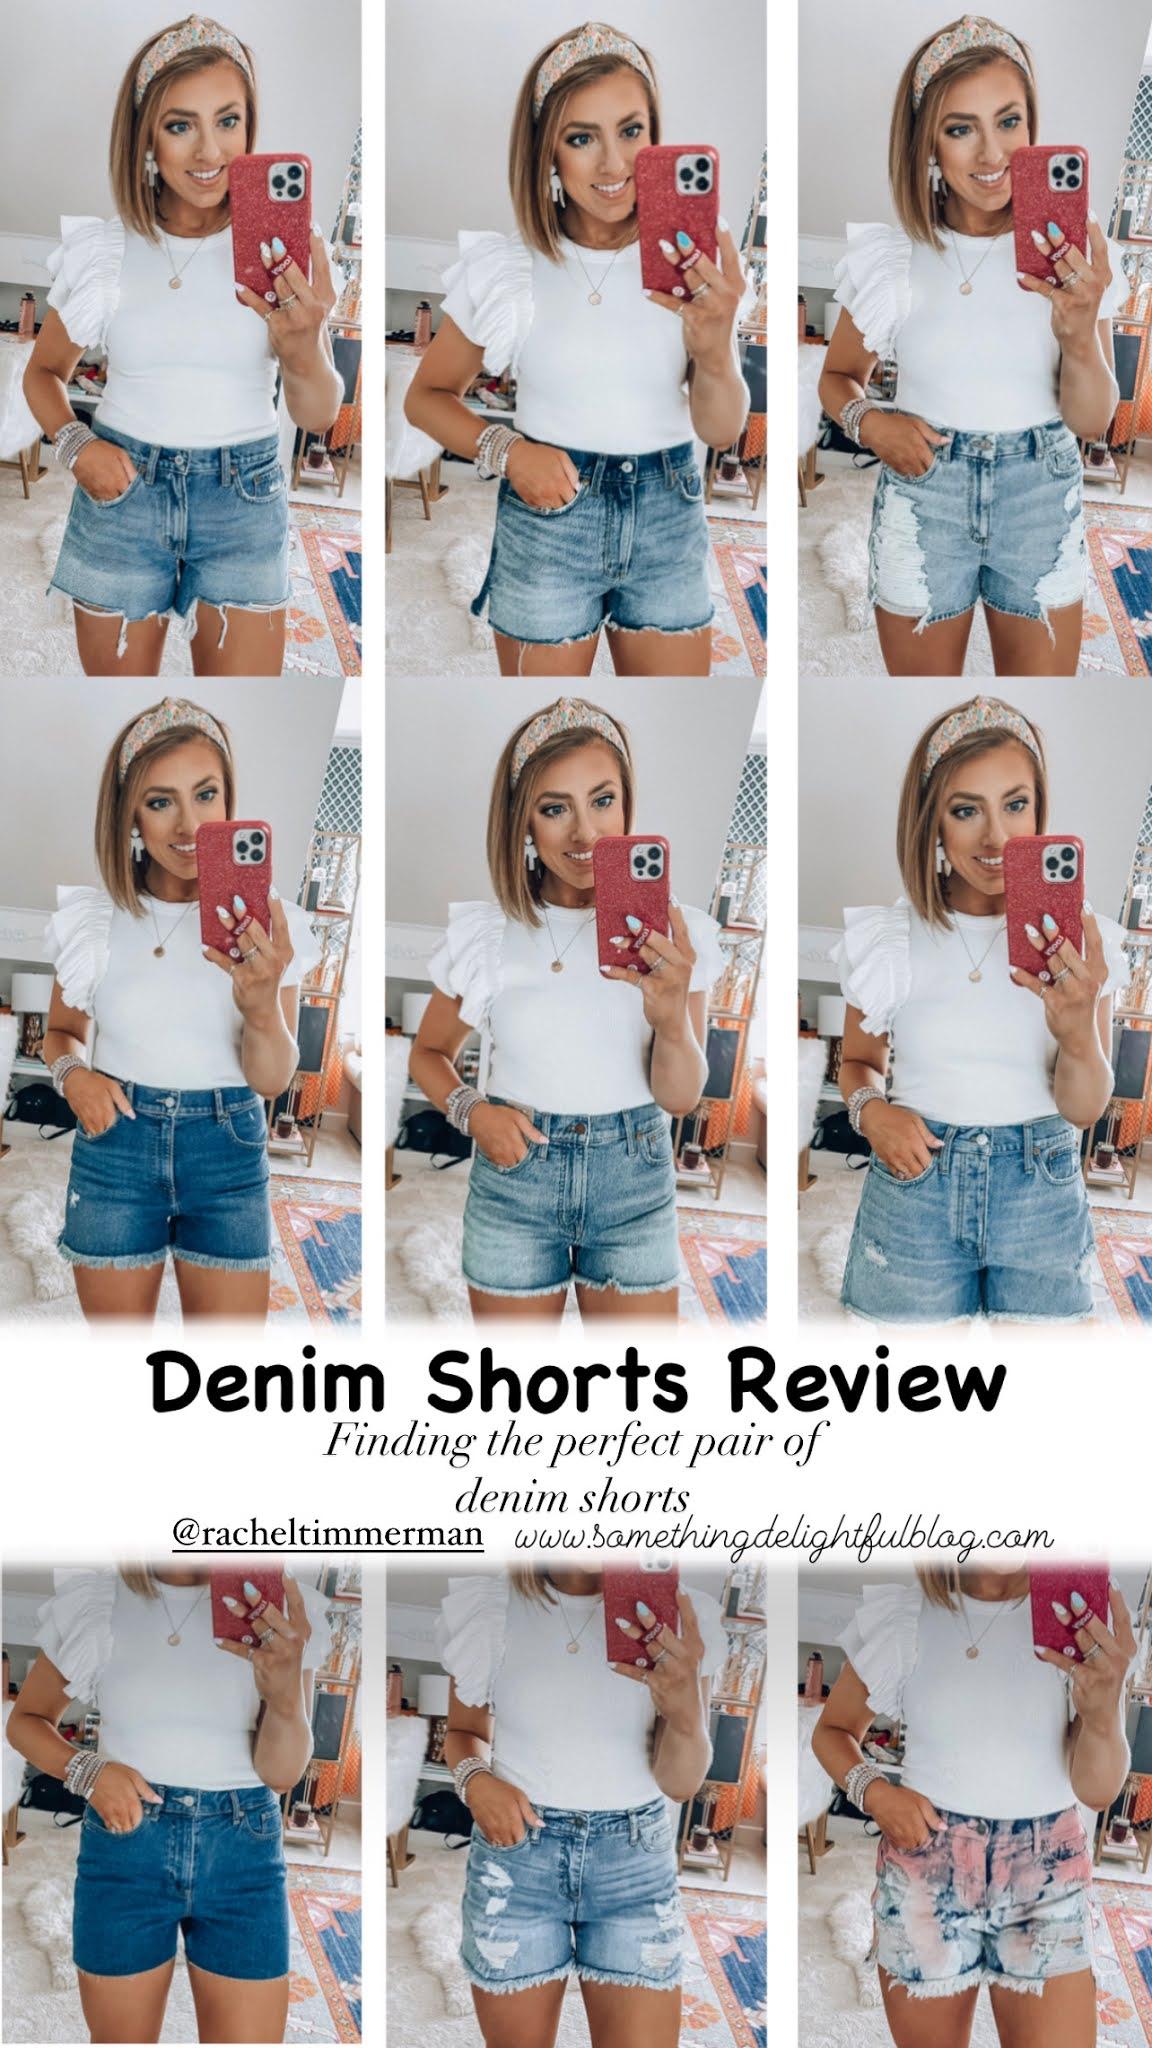 Denim Shorts Review - Finding the perfect pair of denim shorts (11 Pairs) - Something Delightful Blog #denimshorts #muscularlegsdenimshorts #Targetstyle #afdenimshorts #aedenimshorts #spring21fashion #perfectpairdenimshorts